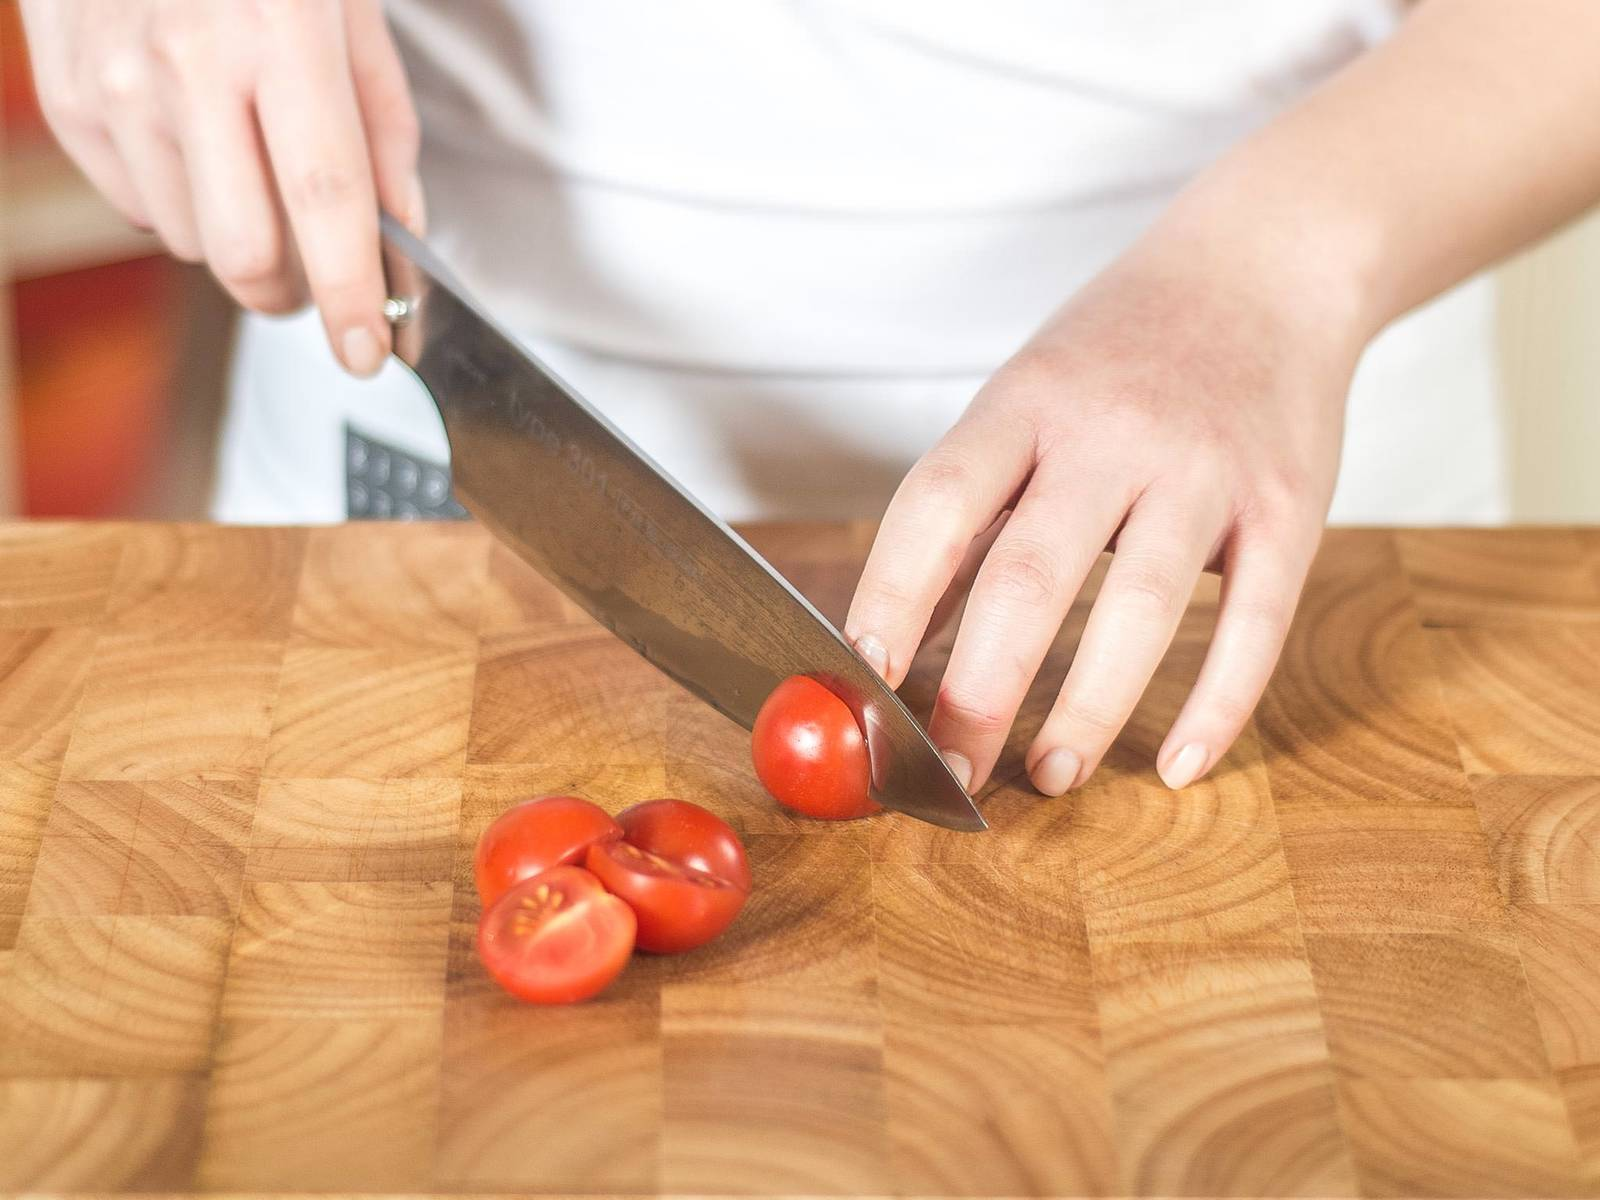 Slice basil into fine strips. Halve cherry tomatoes.